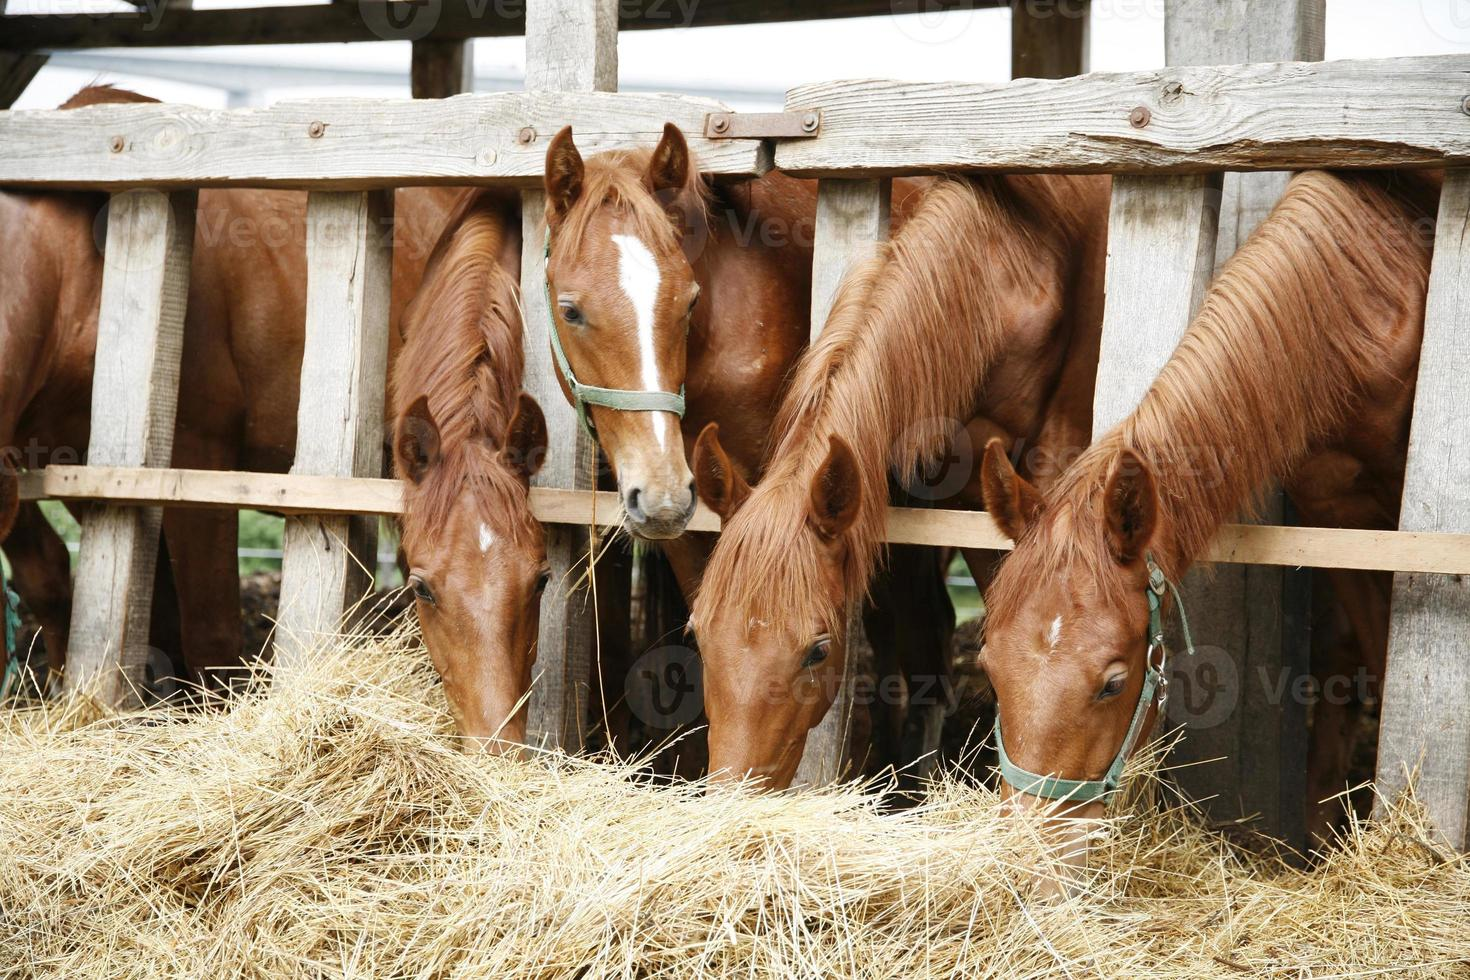 mooie jonge paarden die hooi delen op paardenboerderij foto